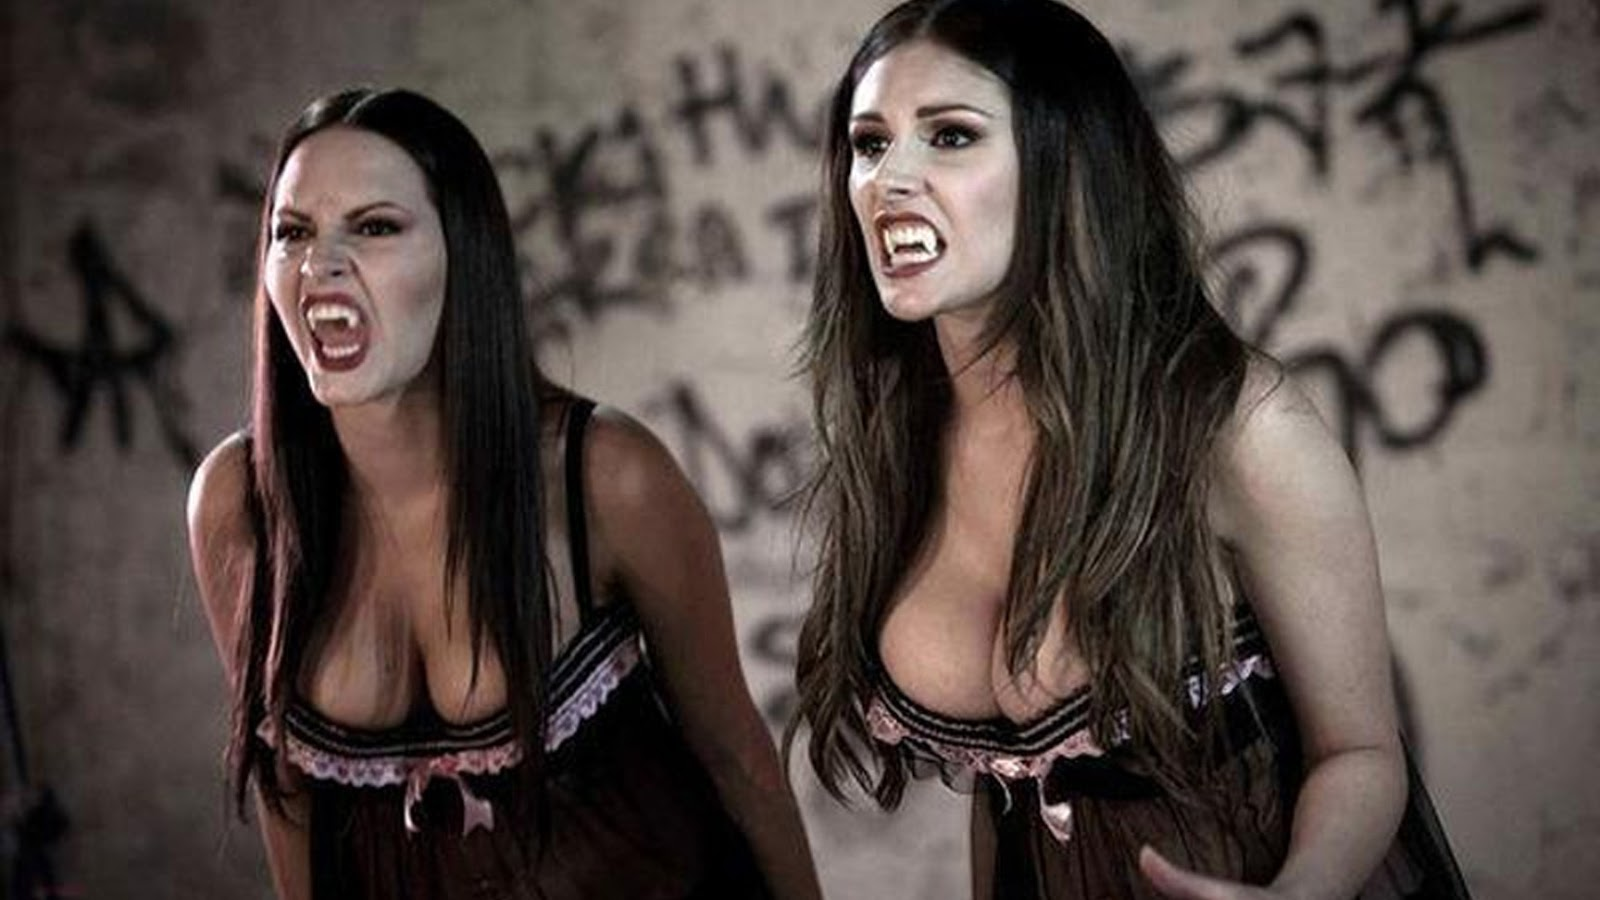 Werewolf strippers in Strippers vs. Werewolves (2012)